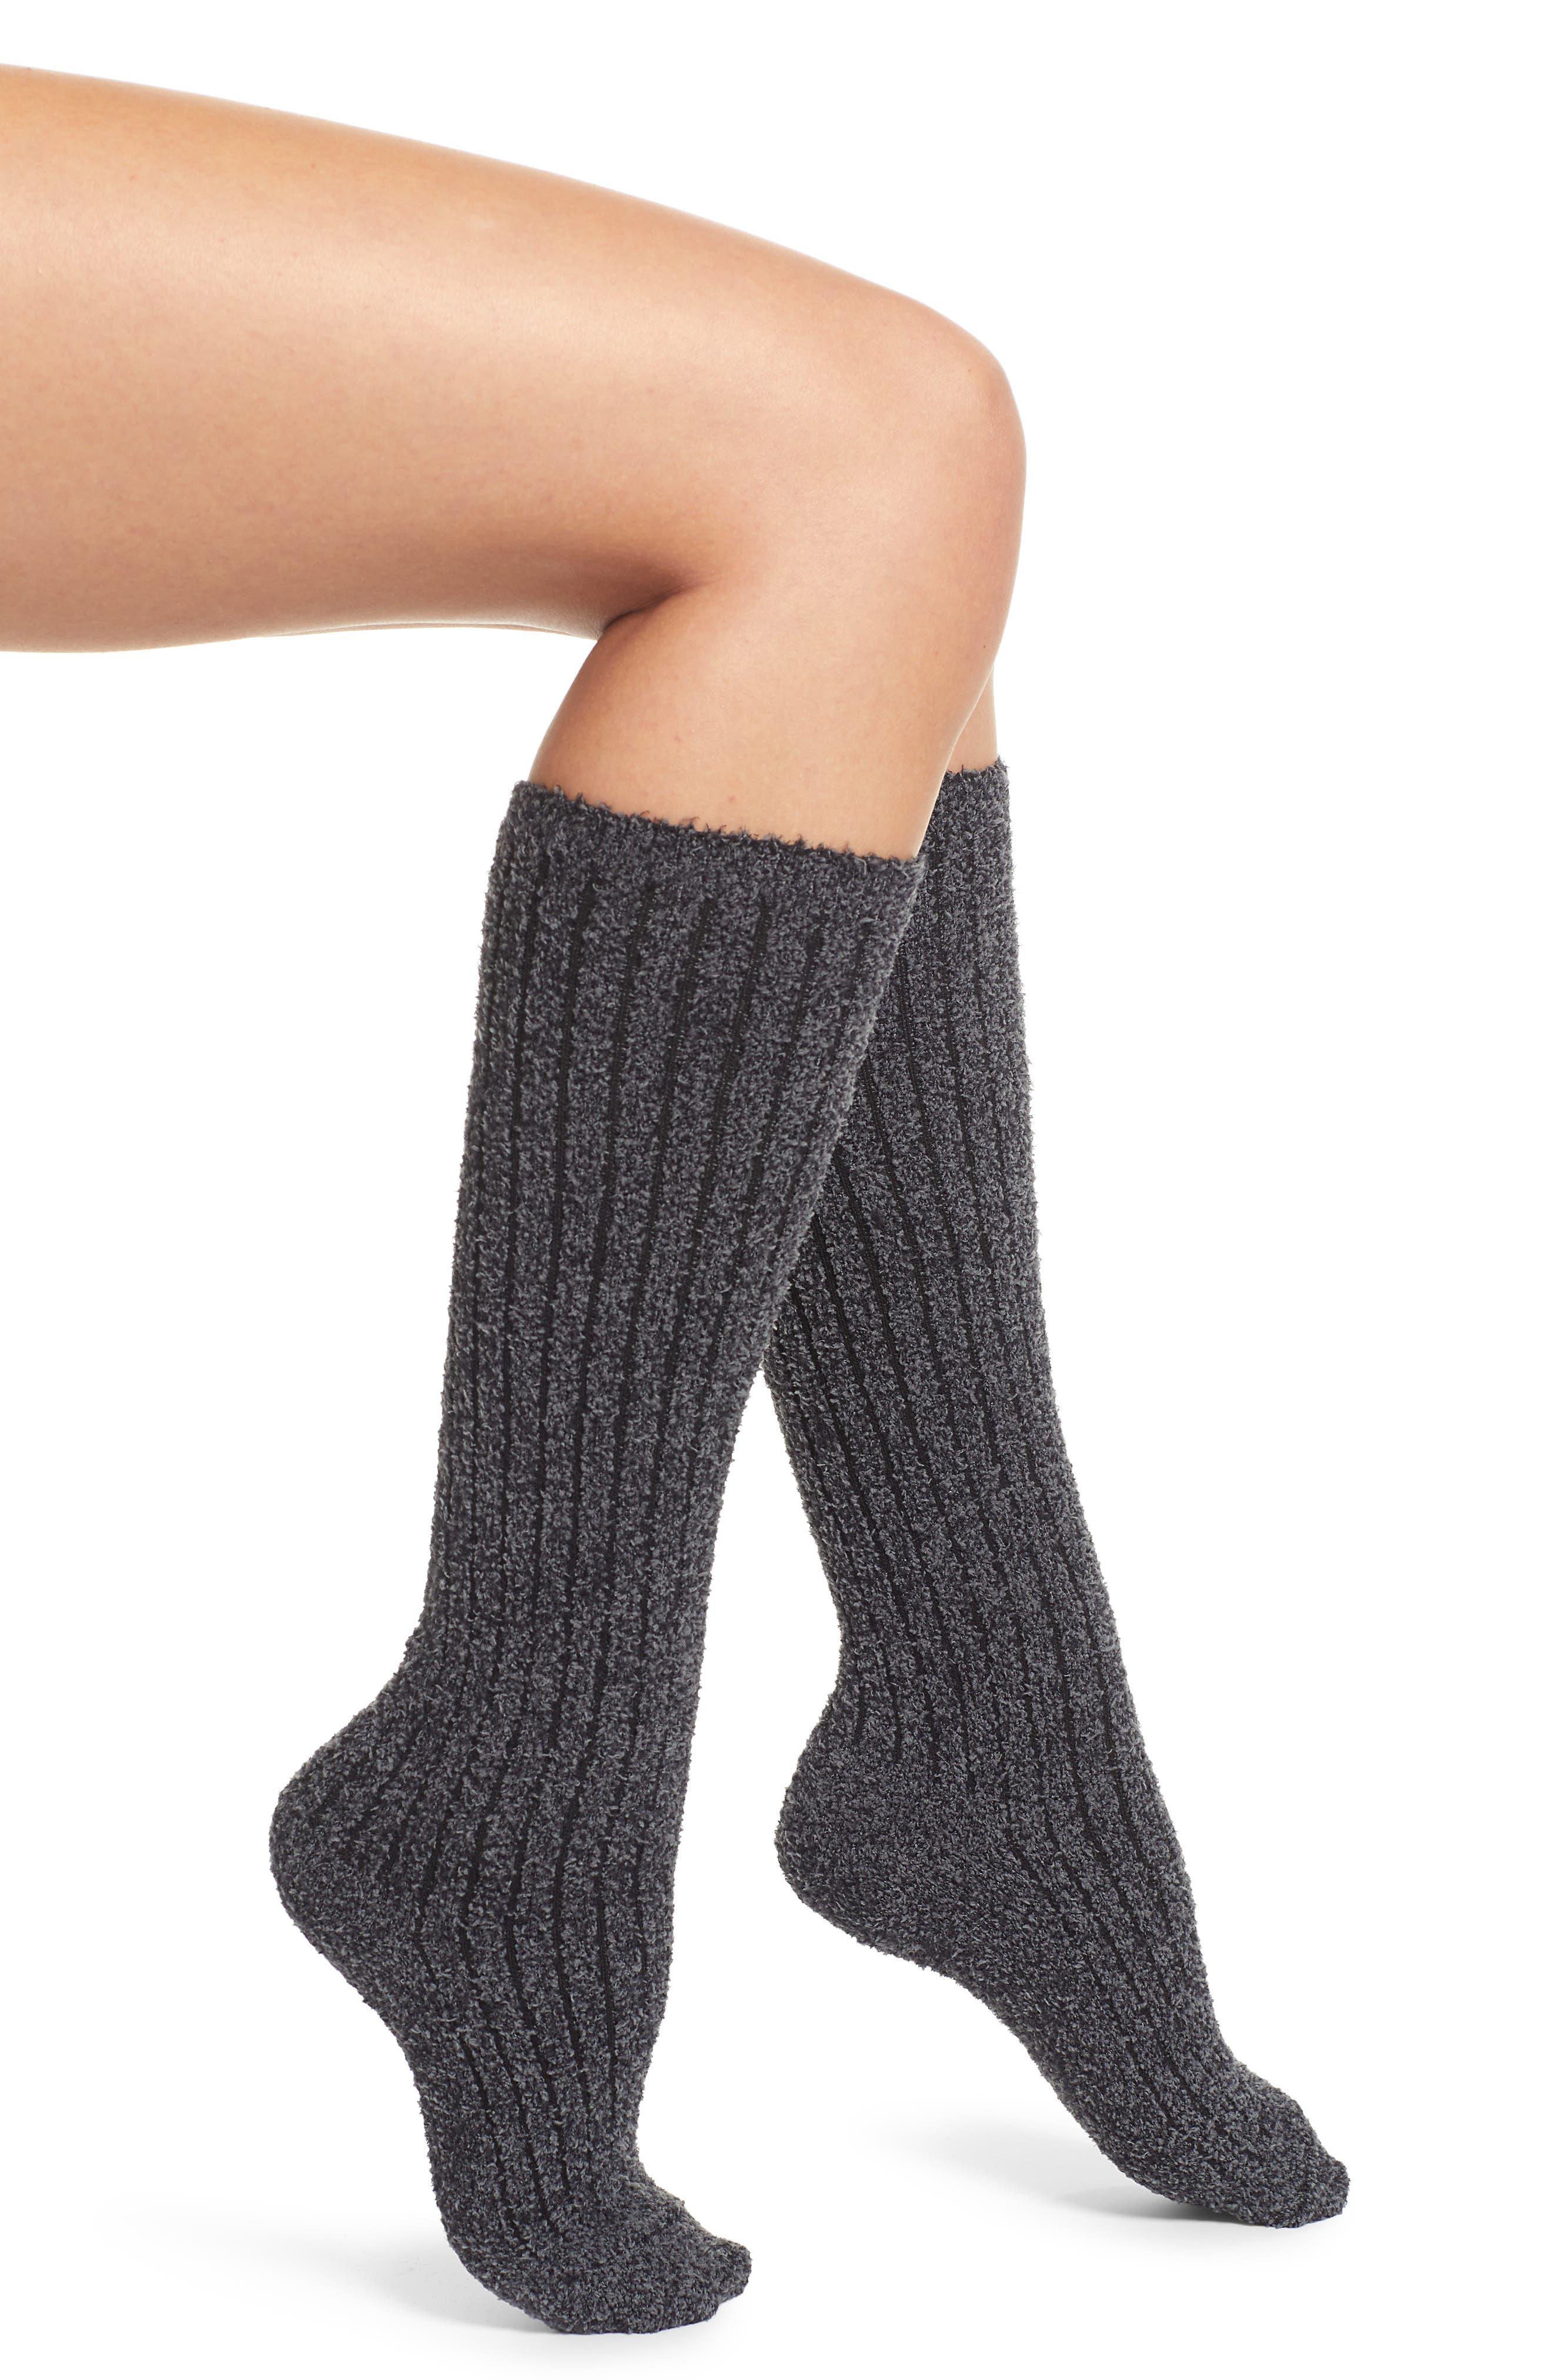 BAREFOOT DREAMS<SUP>®</SUP> CozyChic<sup>™</sup> Rib Knee High Socks, Main, color, HE CARBON/ BLACK